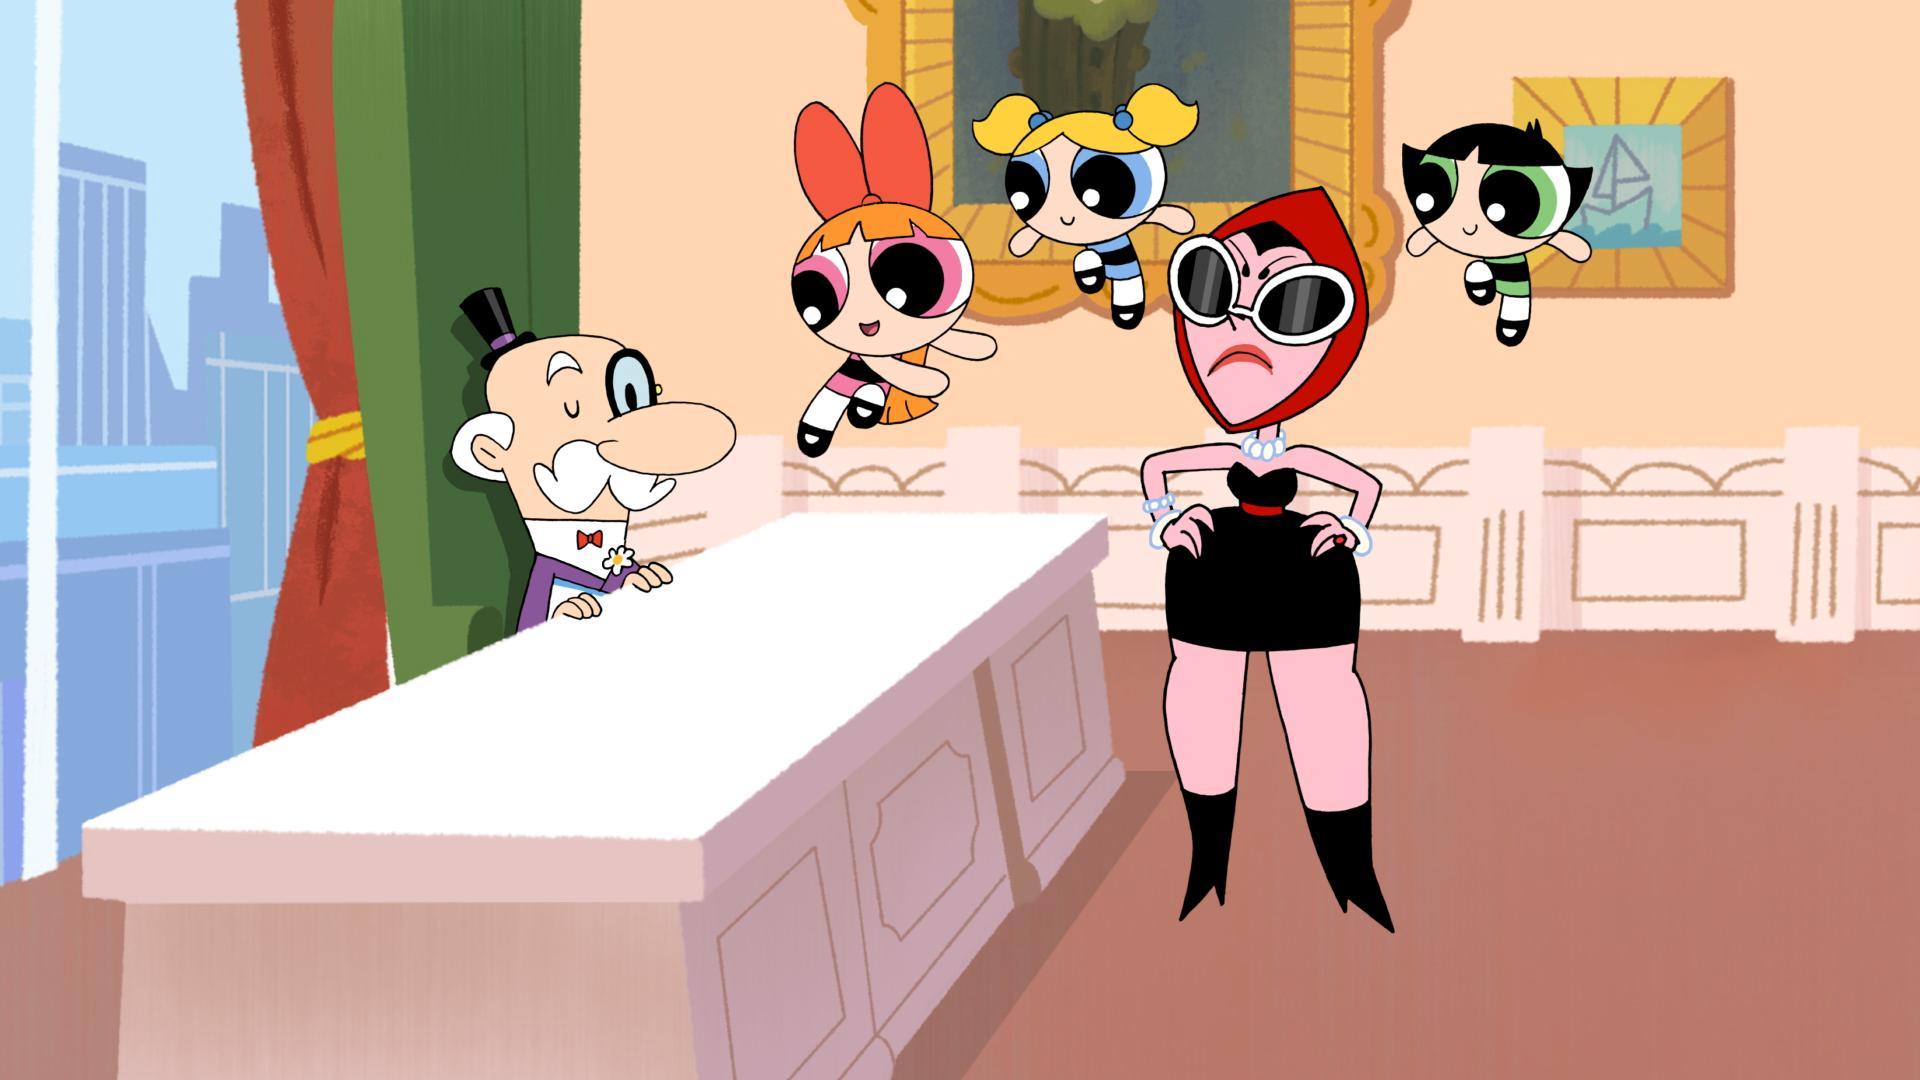 image the powerpuff girls 2016 episode 106 still 1 jpg powerpuff